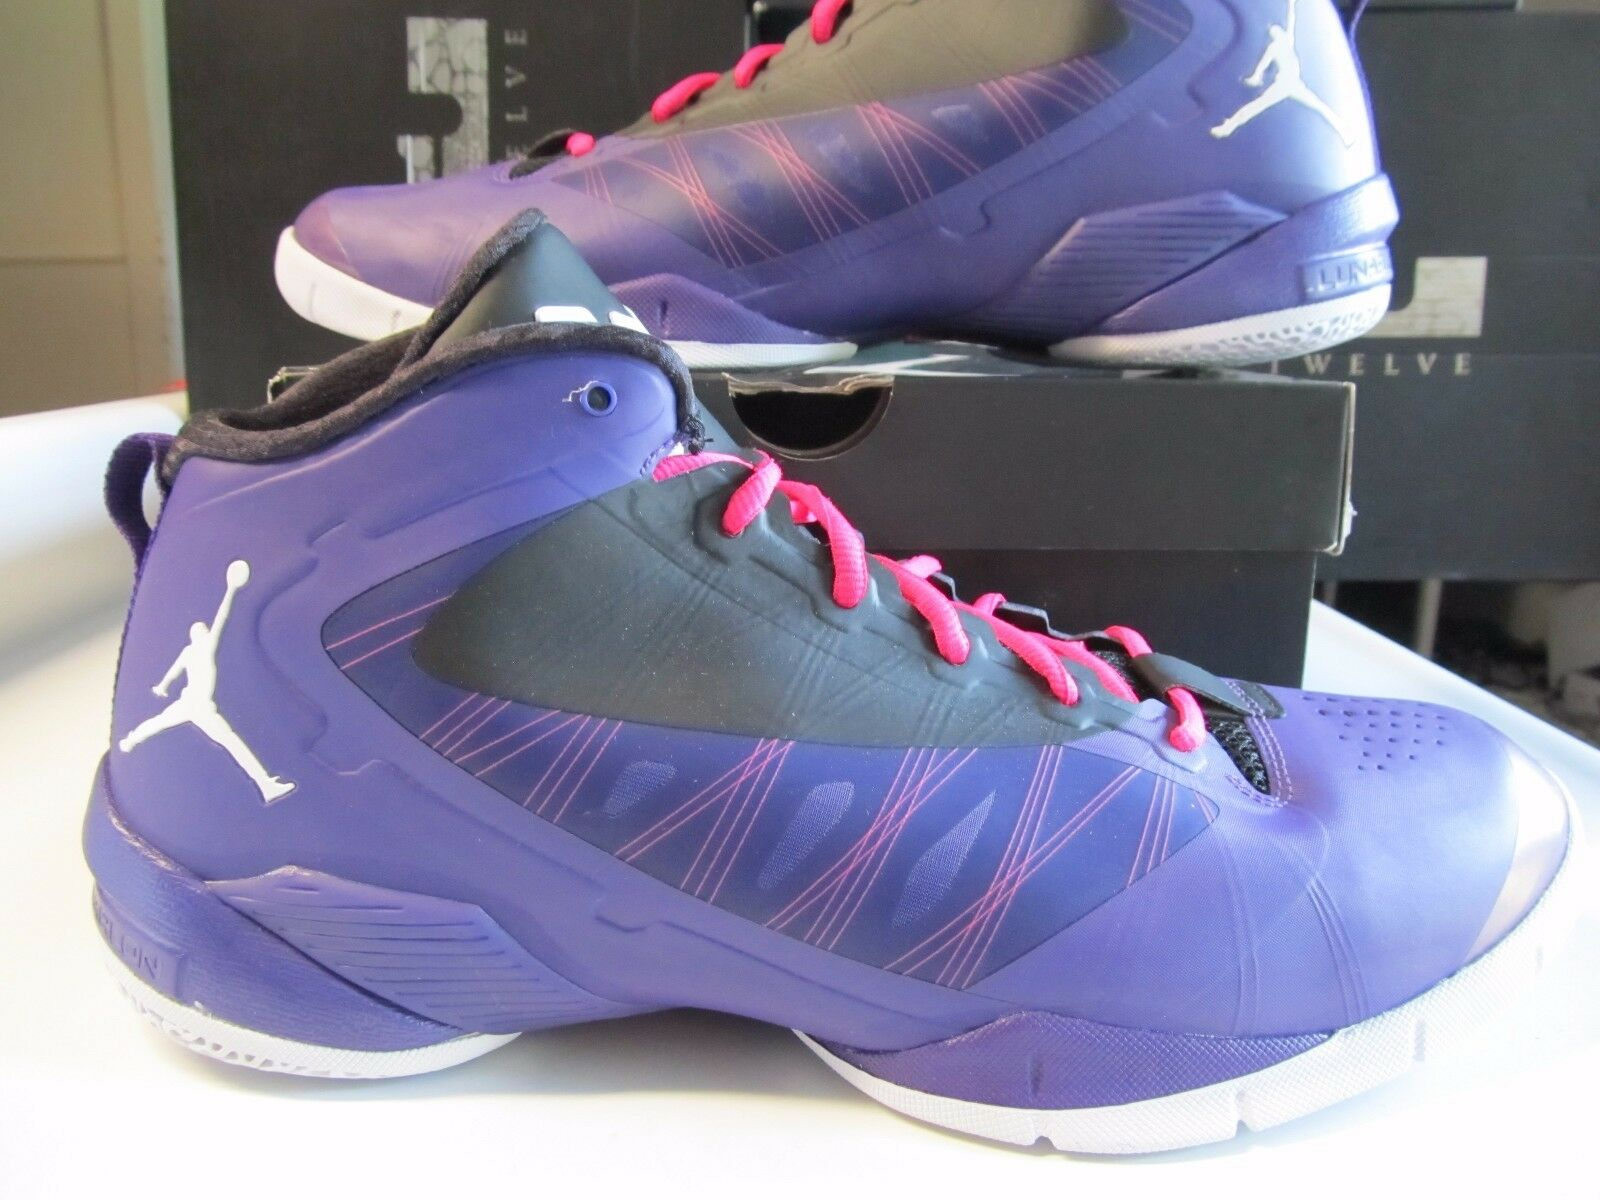 DS Nike Air Jordan Fly Wade 2 EV Purple Wh Black Spark 13 514340 501 south beach